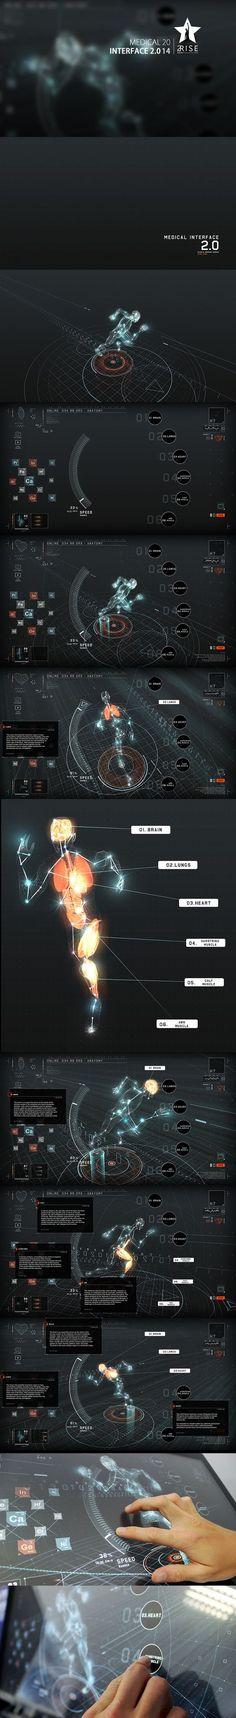 MEDICAL INTERFACE 2.0 by Jedi88.deviantart.com on @deviantART: